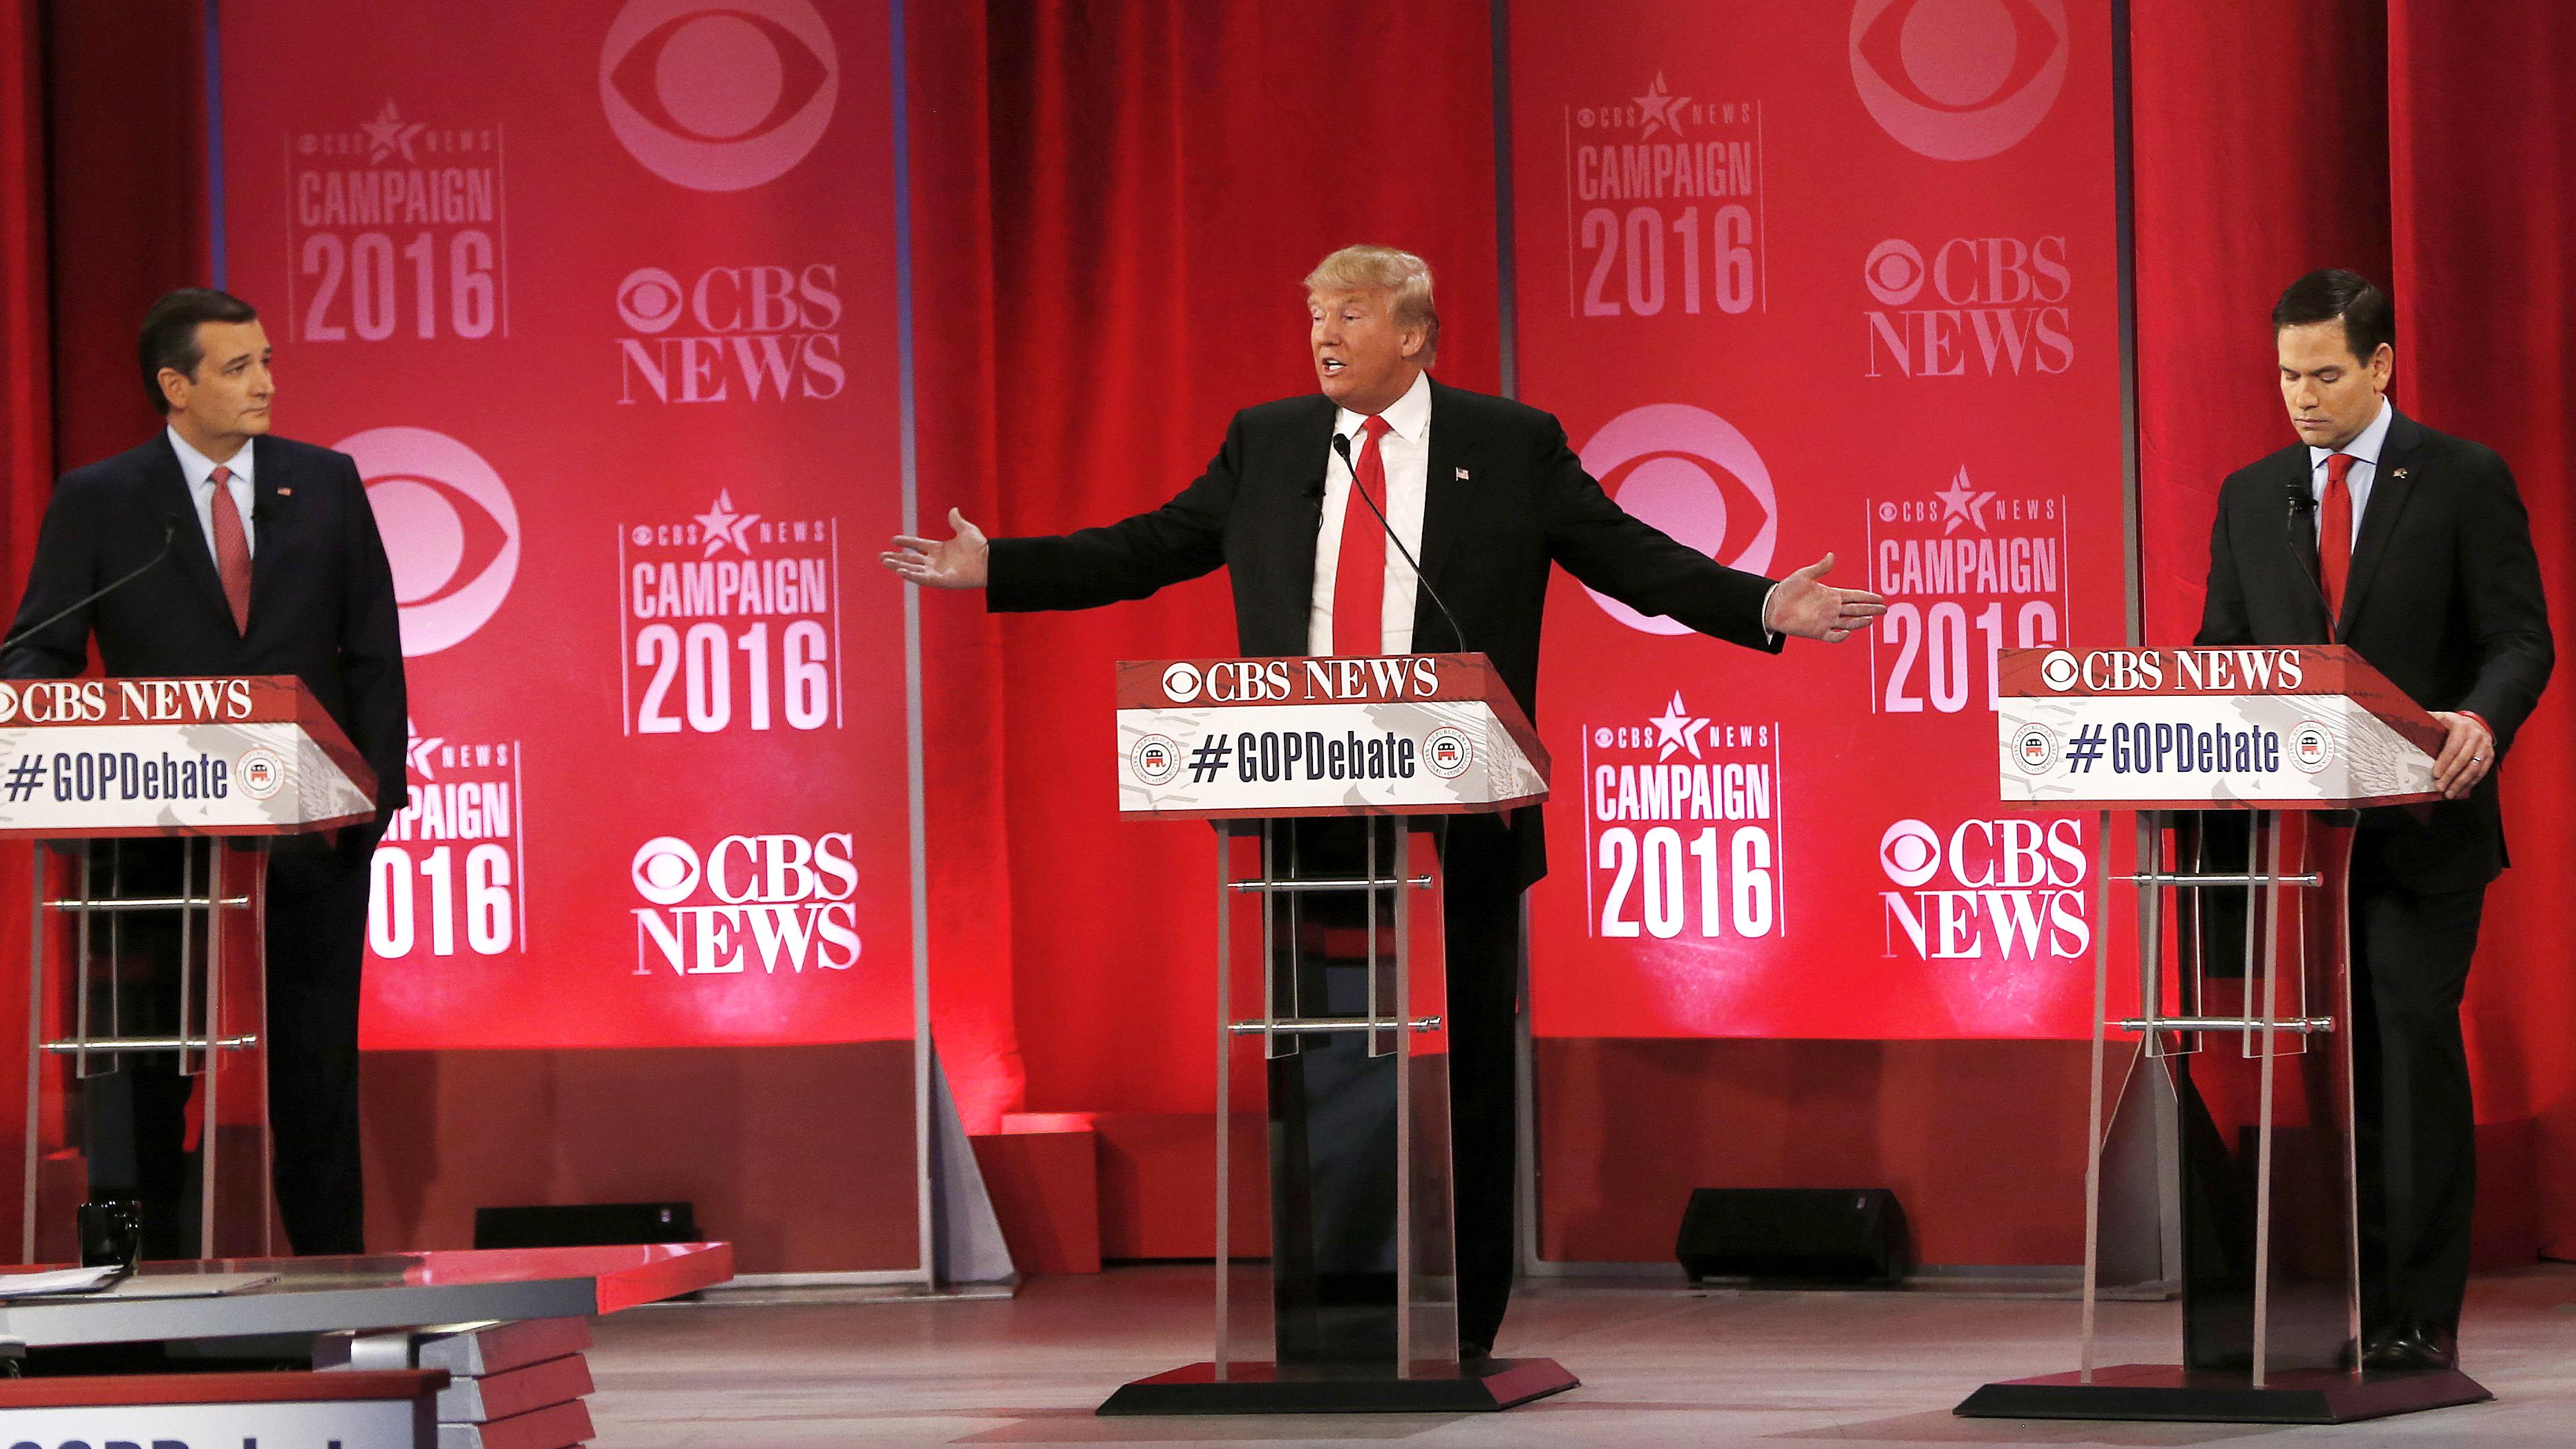 Sparks Fly at Rowdy 2016 Republican Debate in South Carolina